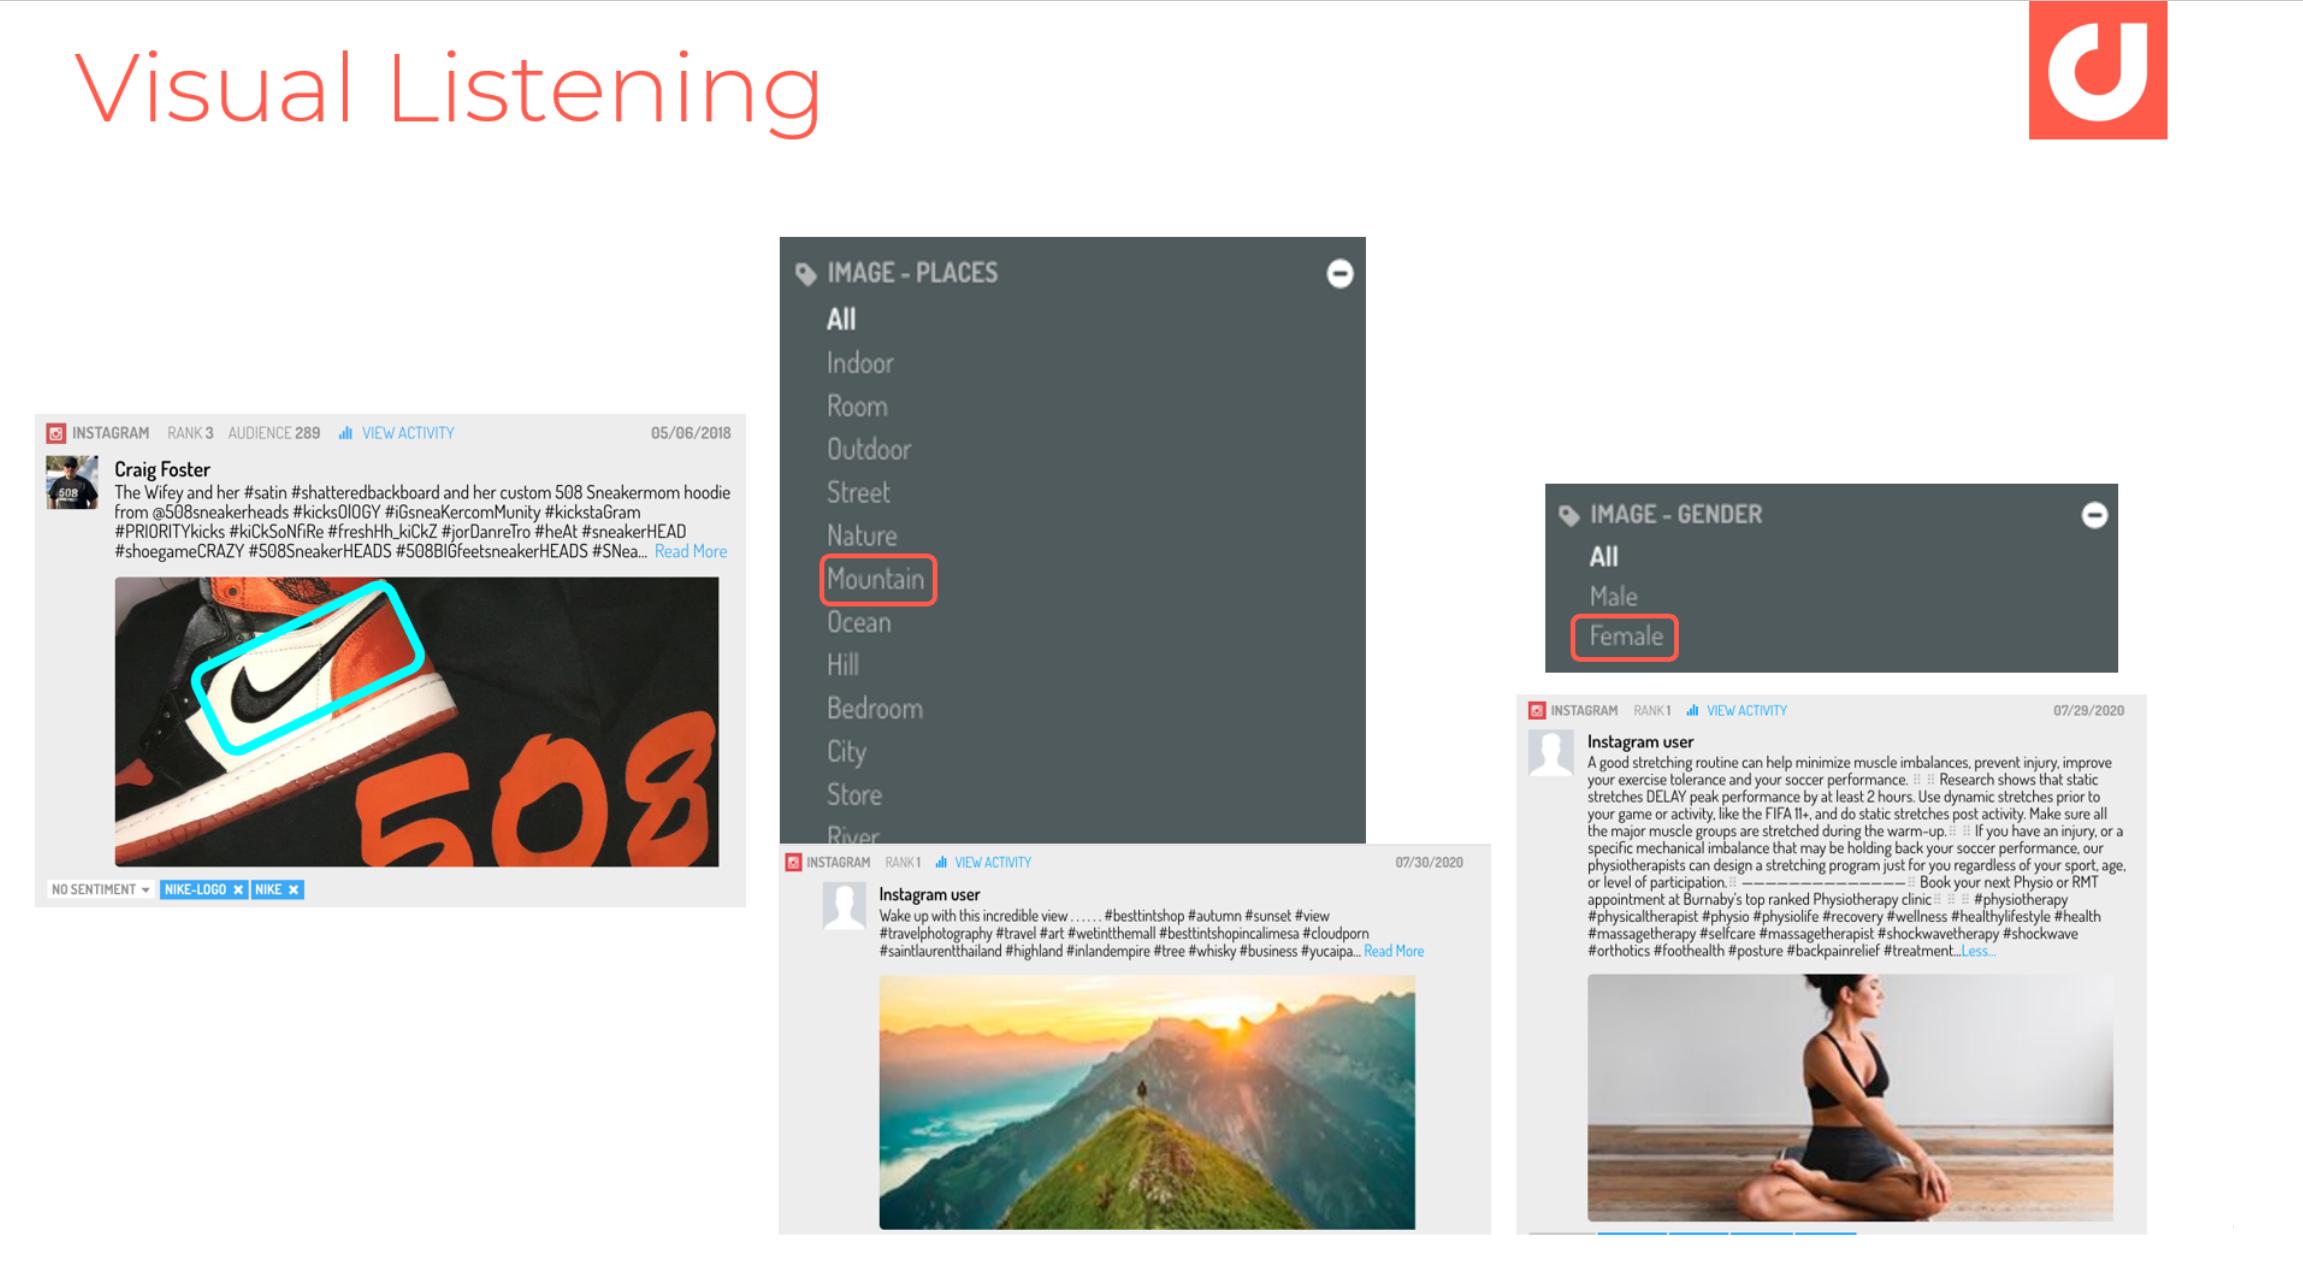 Les applications du visual listening par Machine Learning